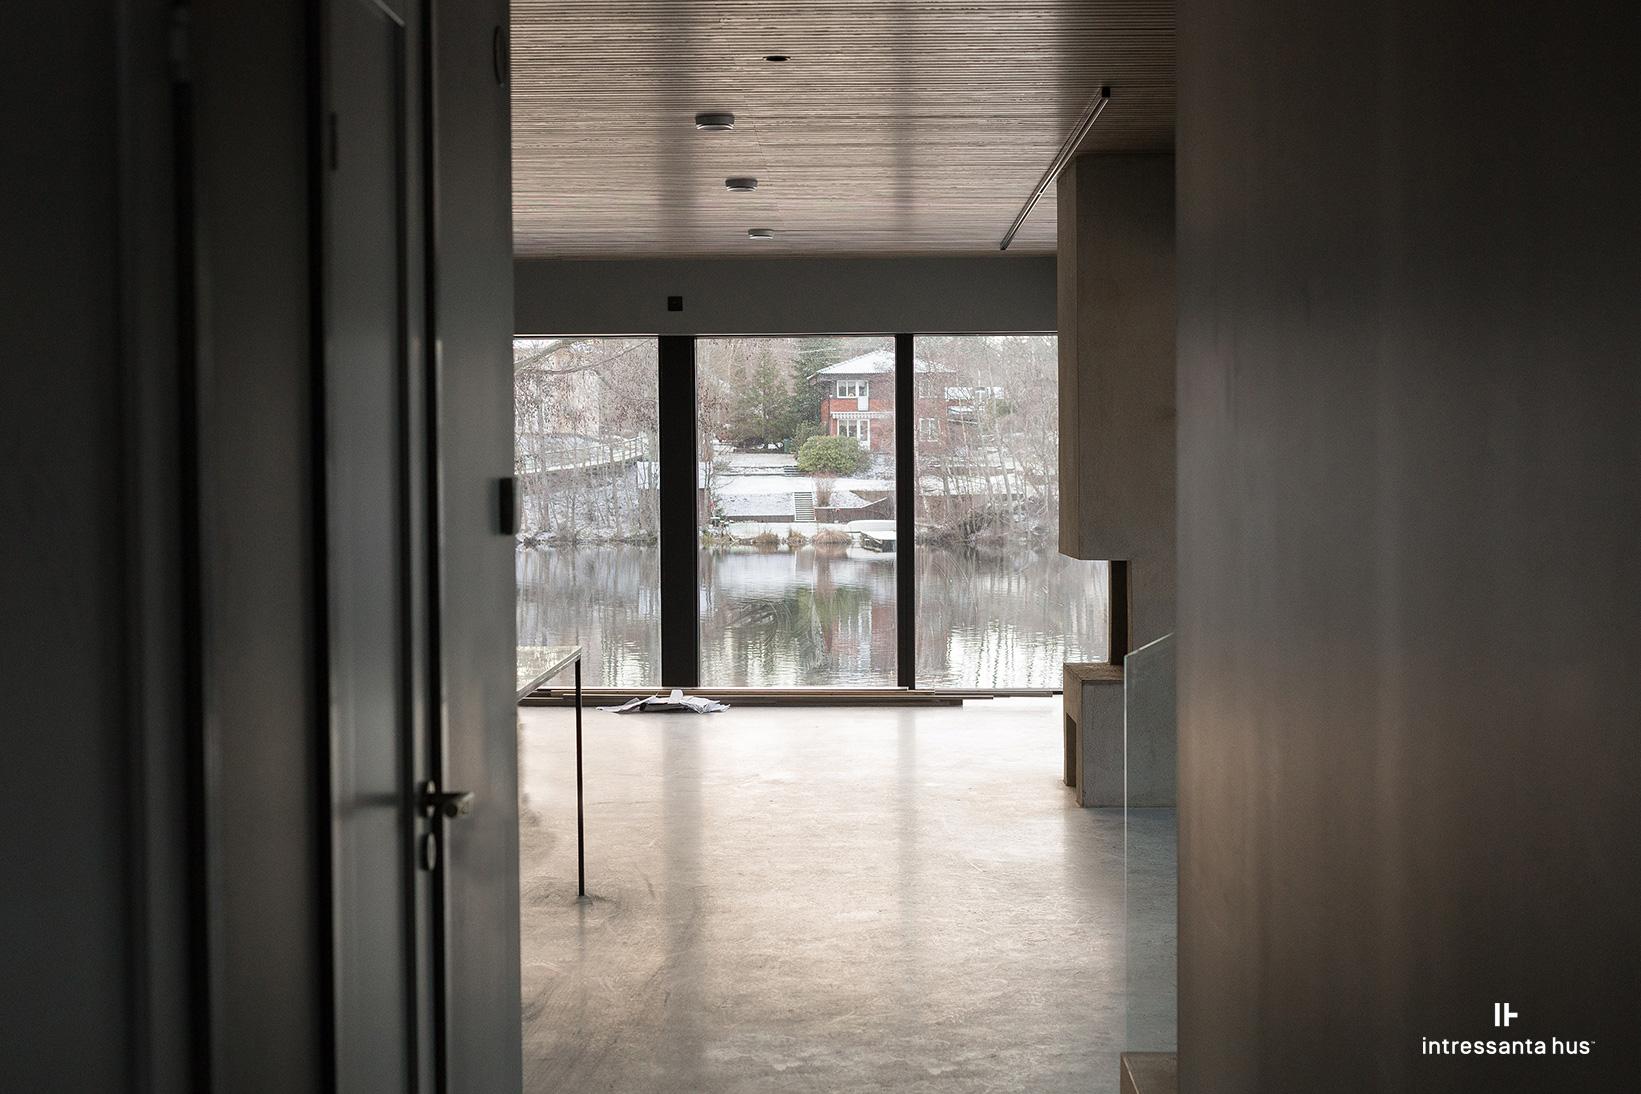 intressantahus-house1-061